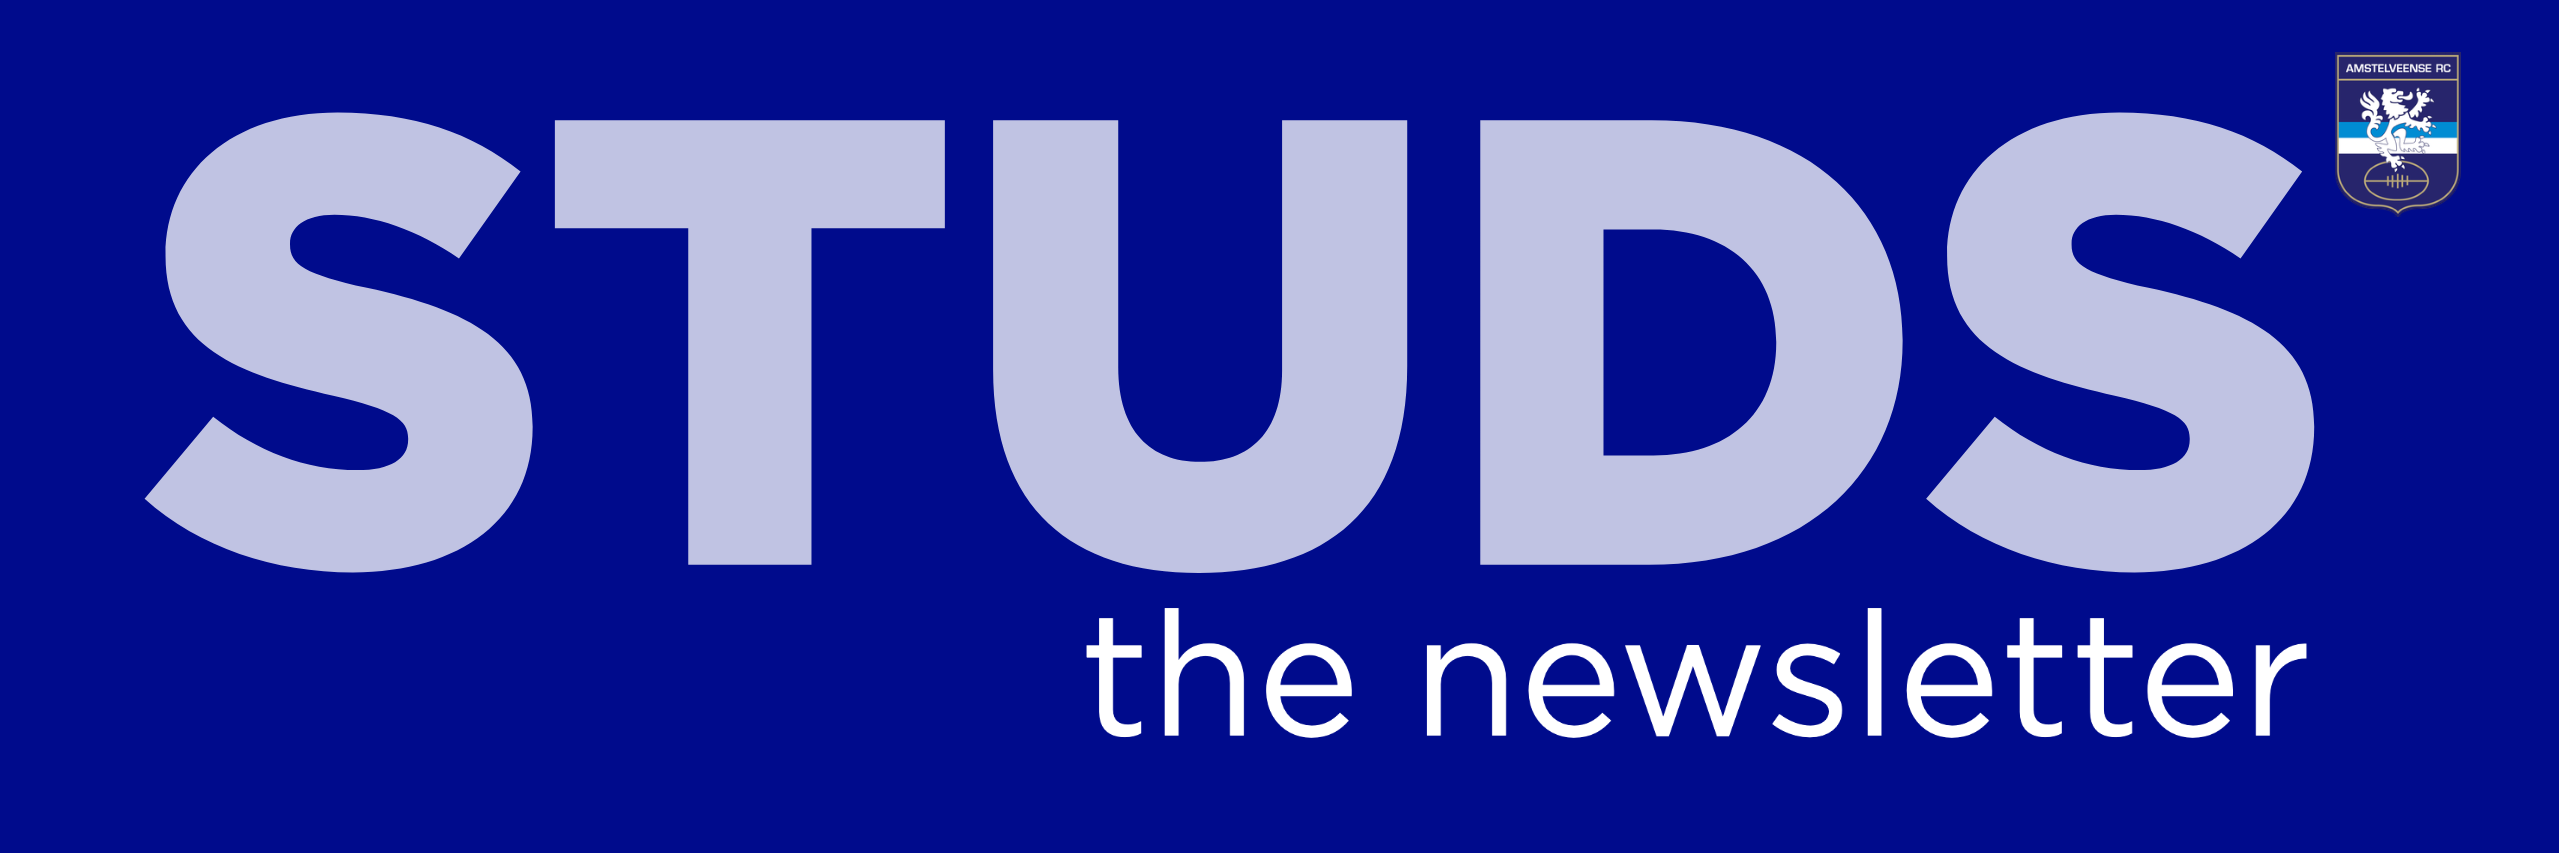 header Studs Nieuwsbrief ARC